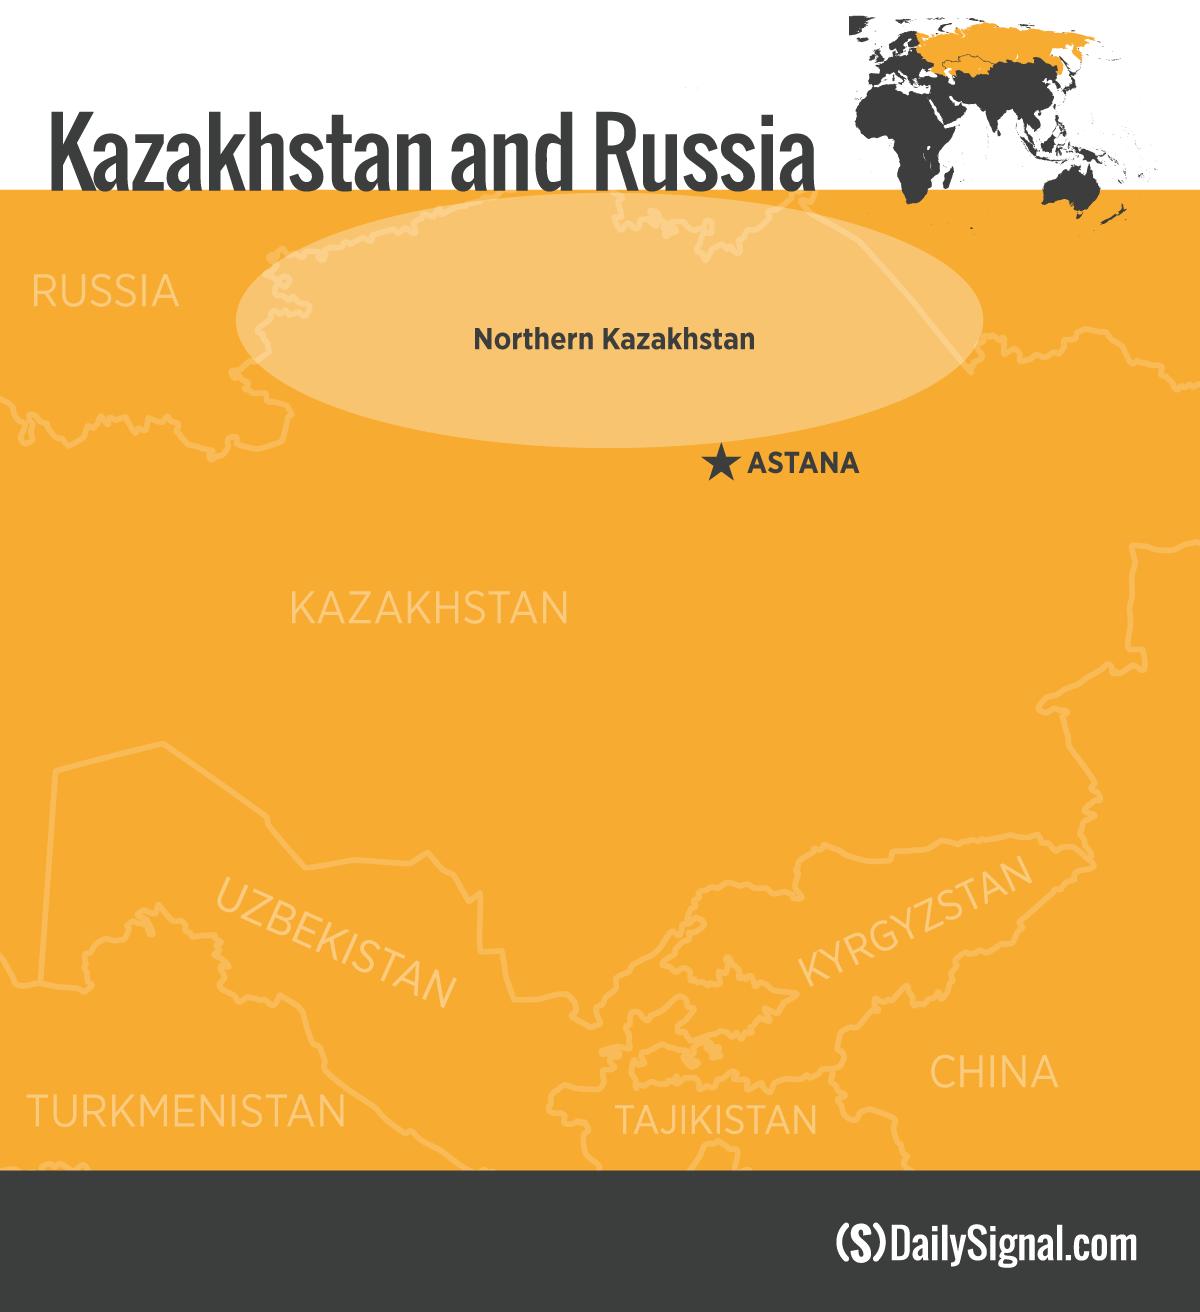 160919_russia-maps_kazakhstan_v2